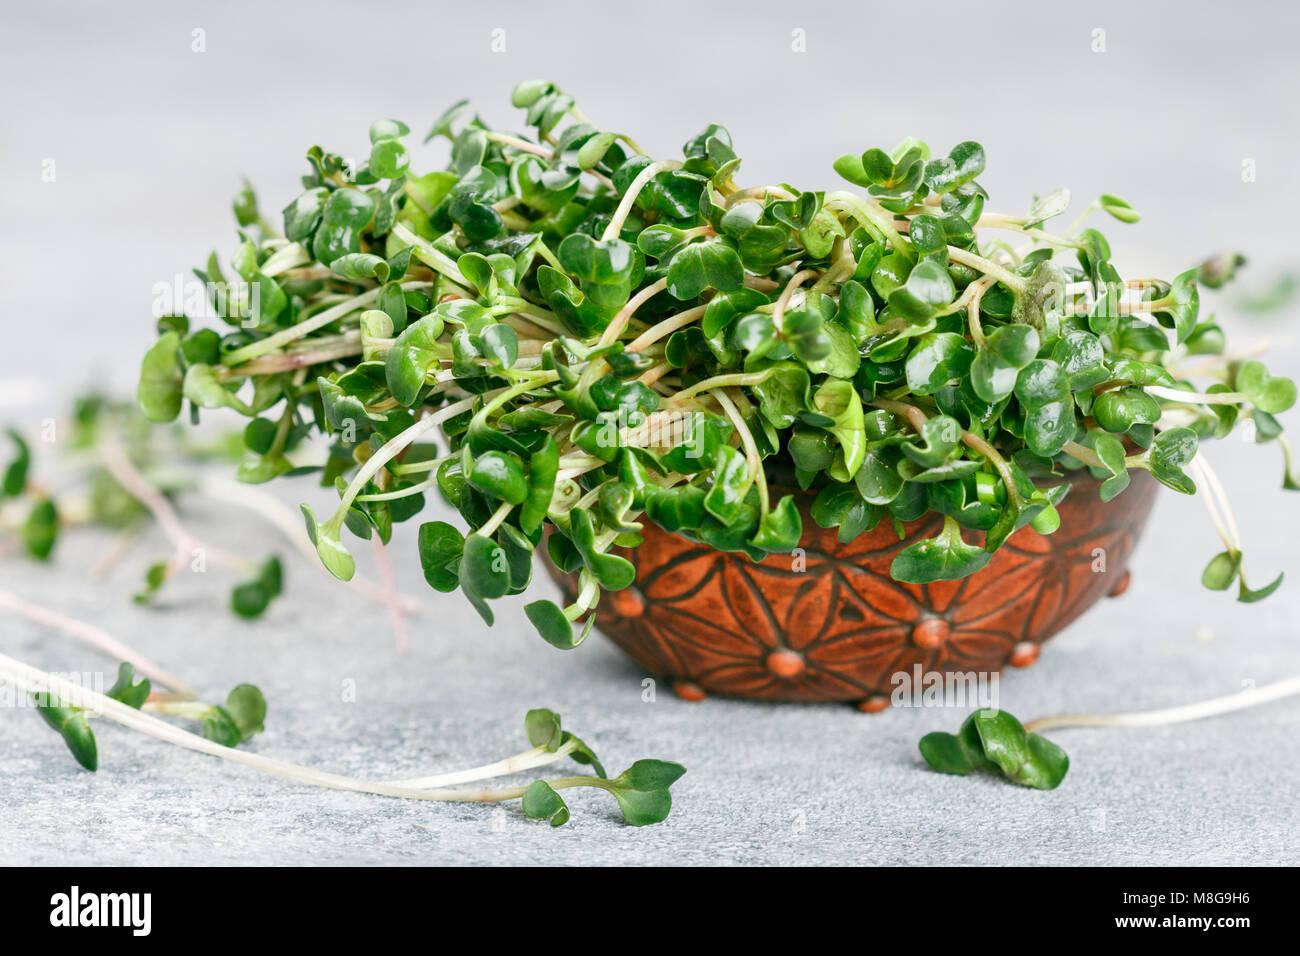 Raw Green Organic radish or daikon Microgreens for making fresh salads. detox, diet. seedlings. Concept and healthy Stock Photo